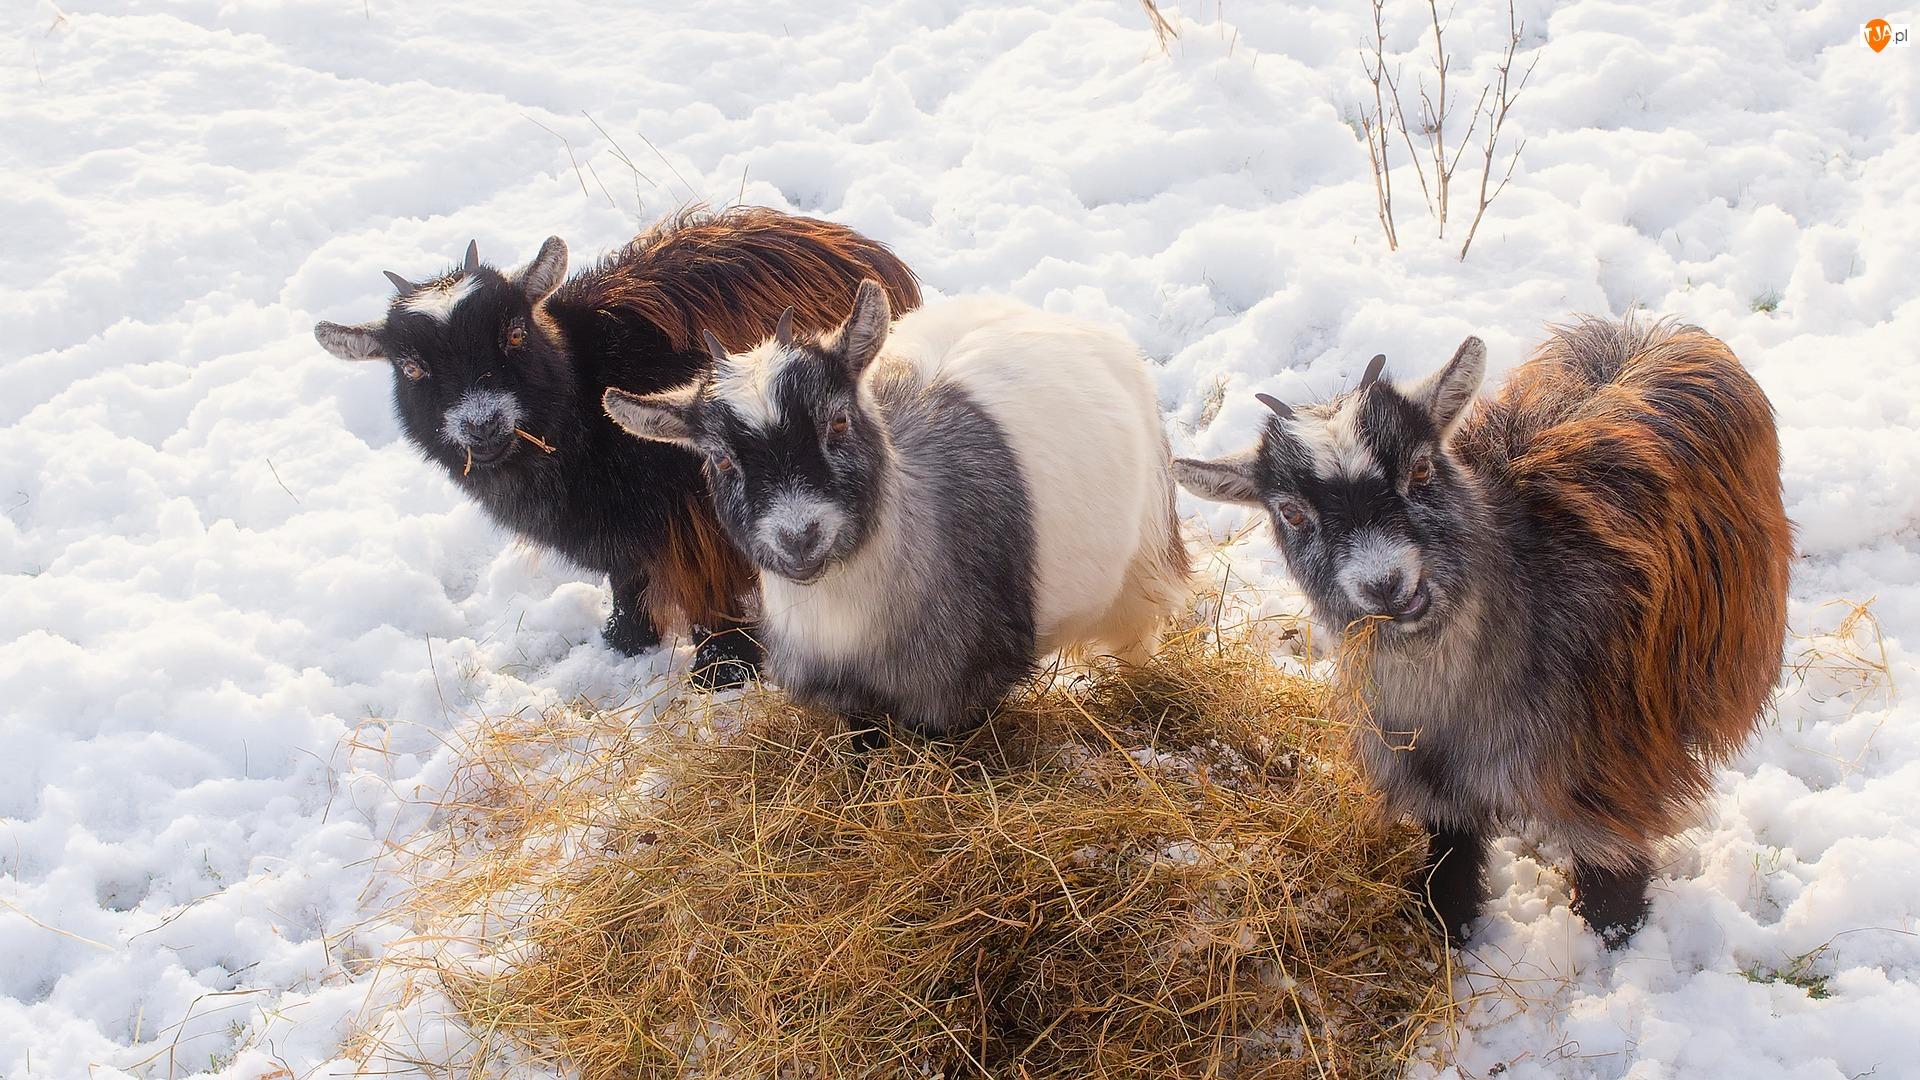 Kozy, Śnieg, Młode, Trzy, Siano